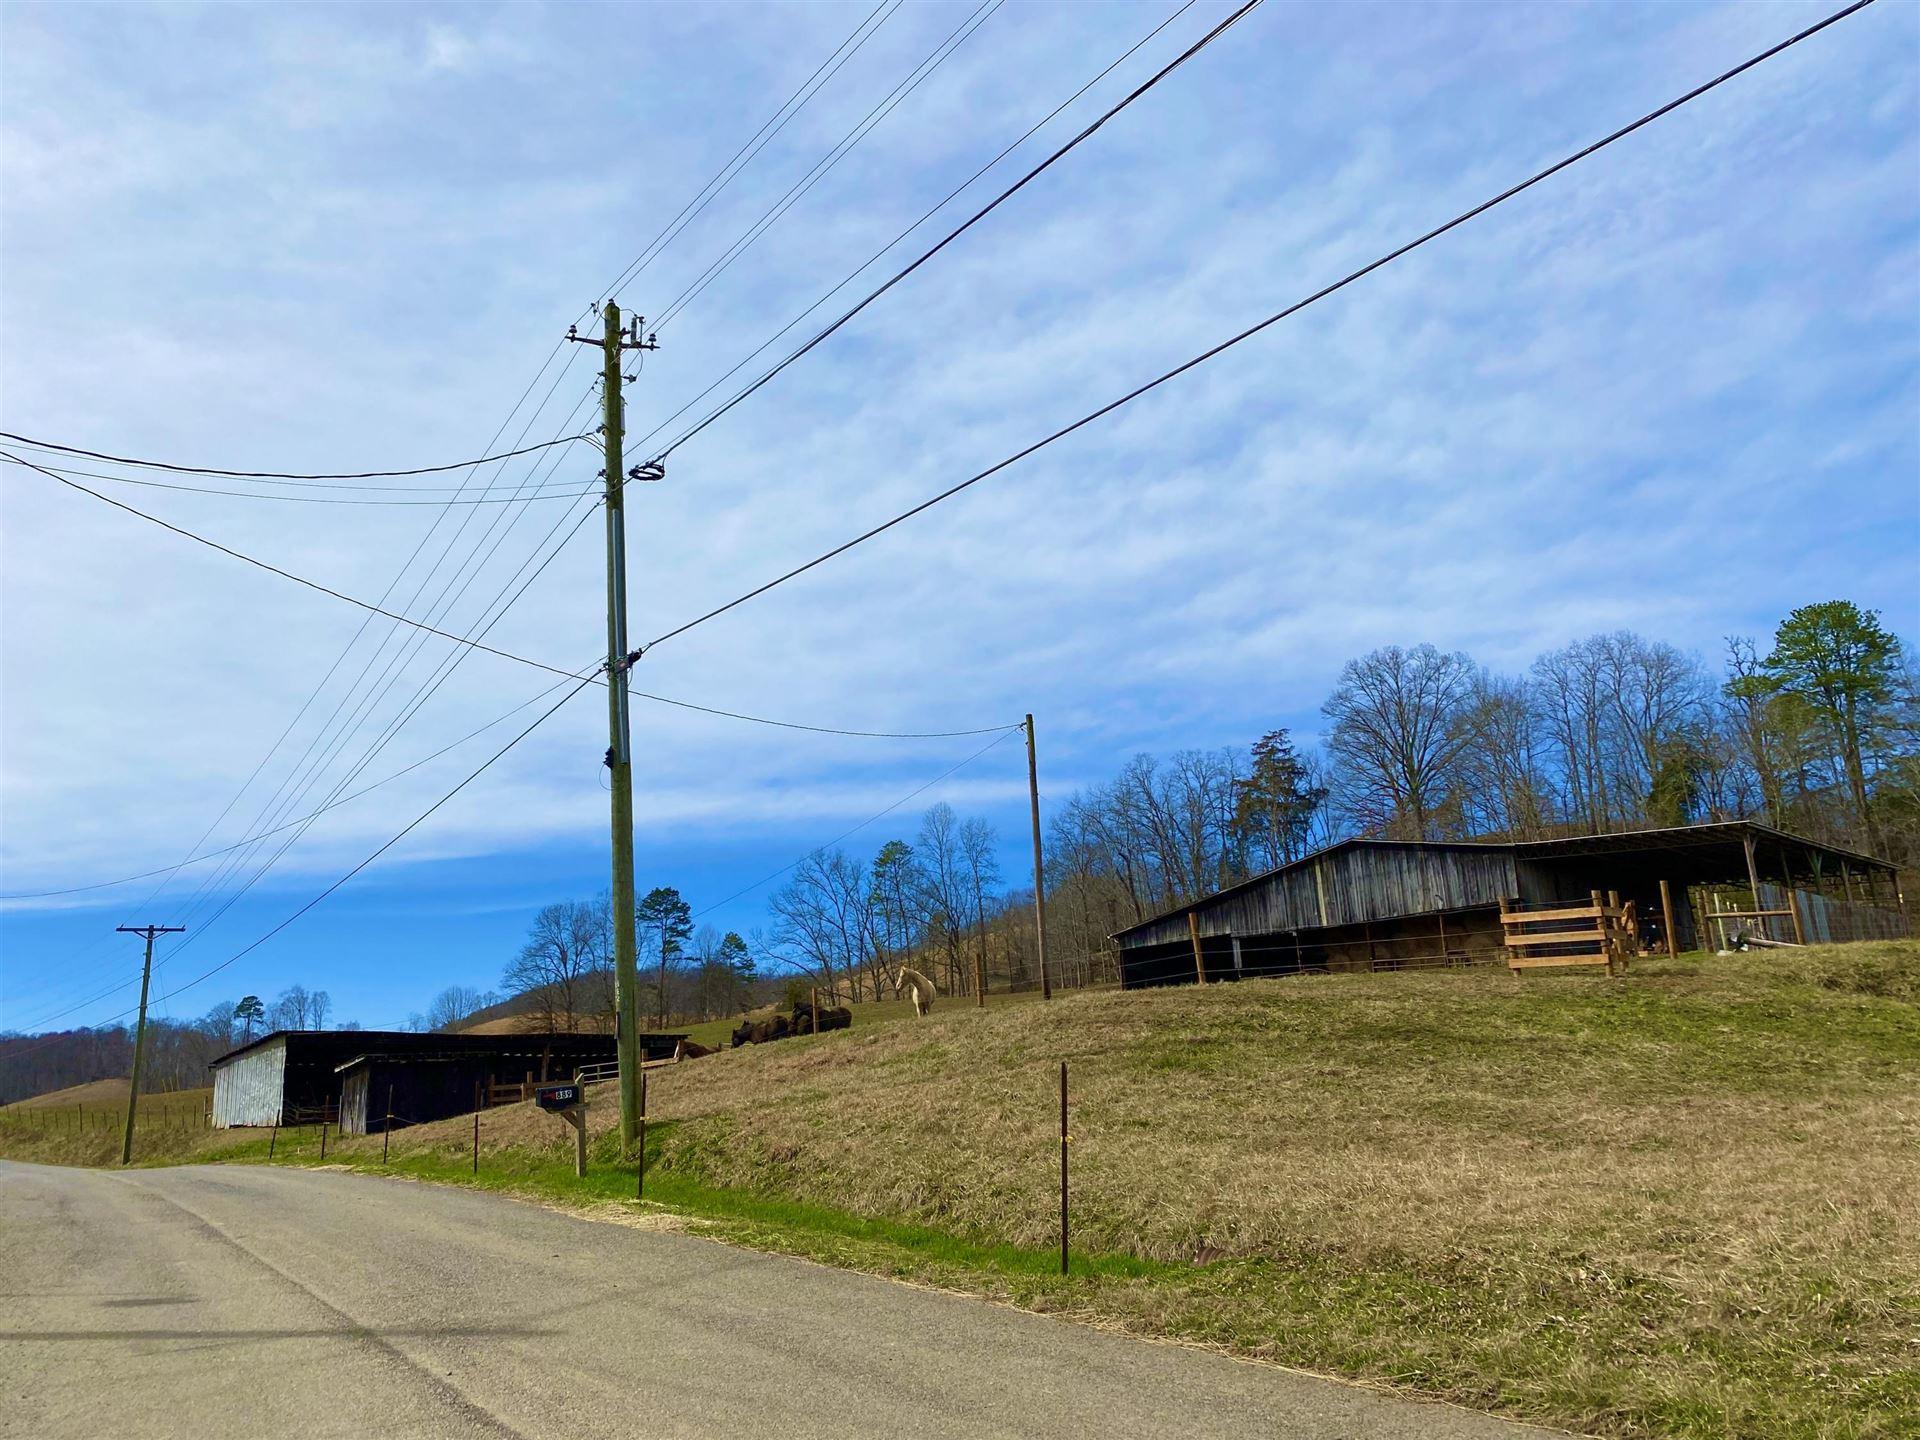 Photo of Tbd Caney Valley Loop, Surgoinsville, TN 37873 (MLS # 9919638)